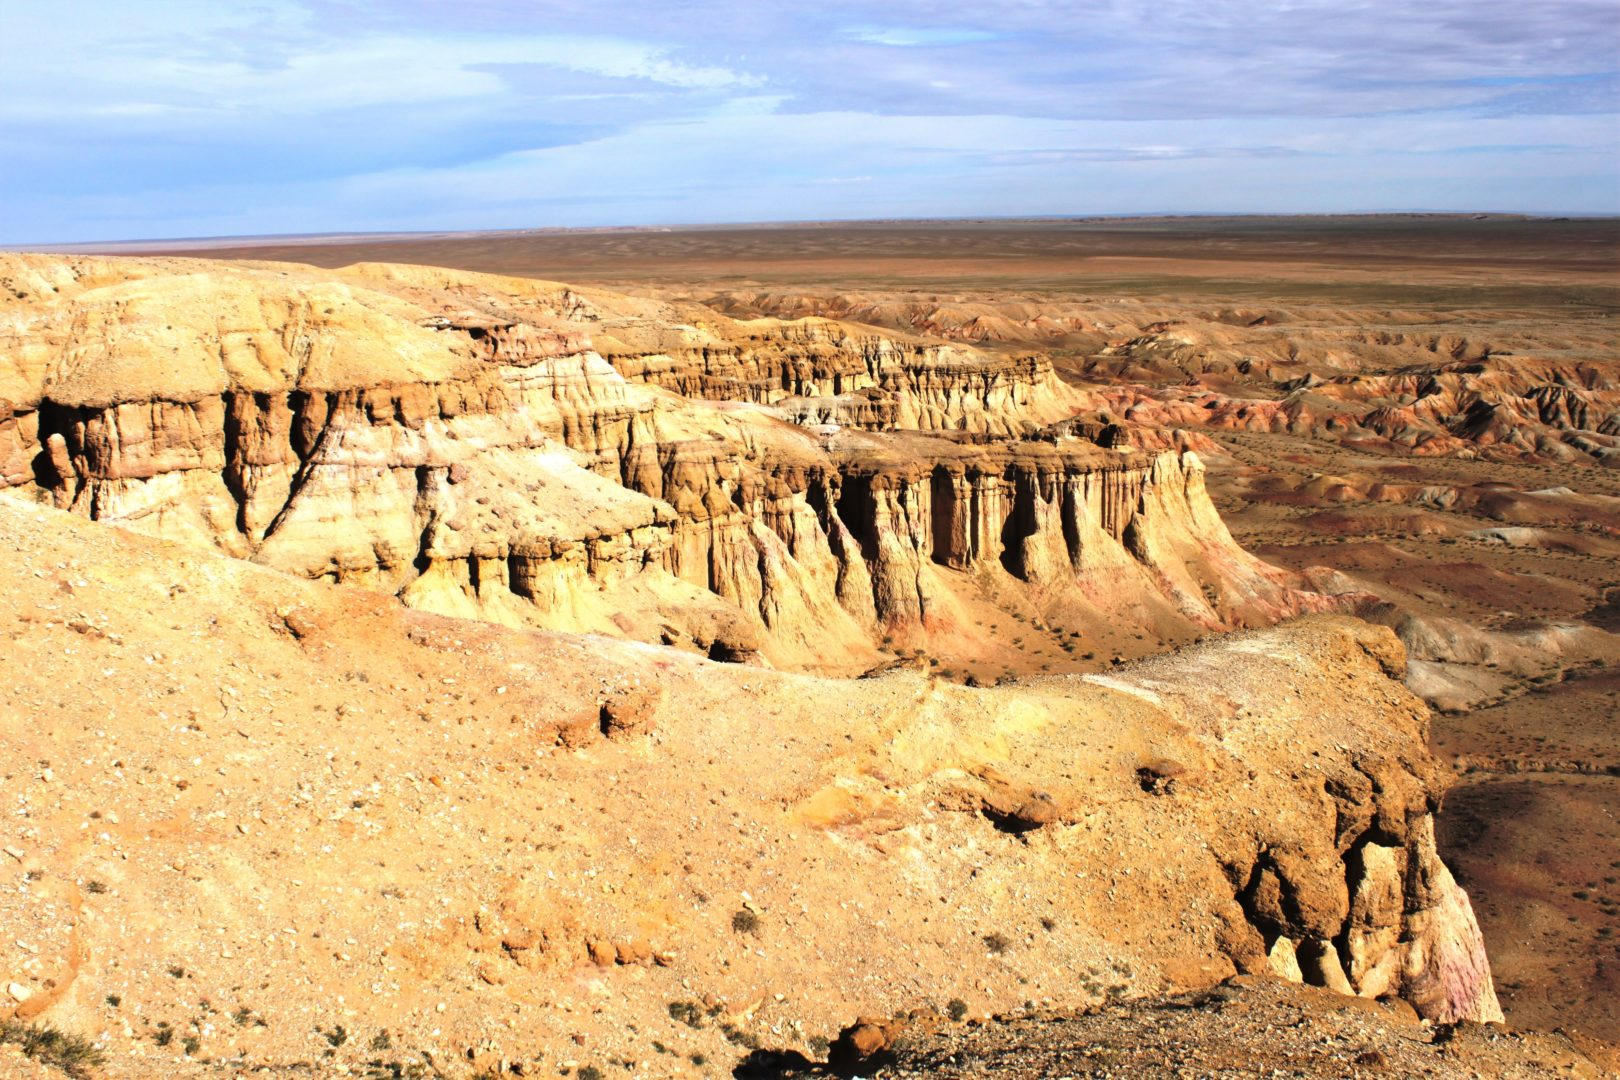 Mongolei-Reise: Gobi und Steppe